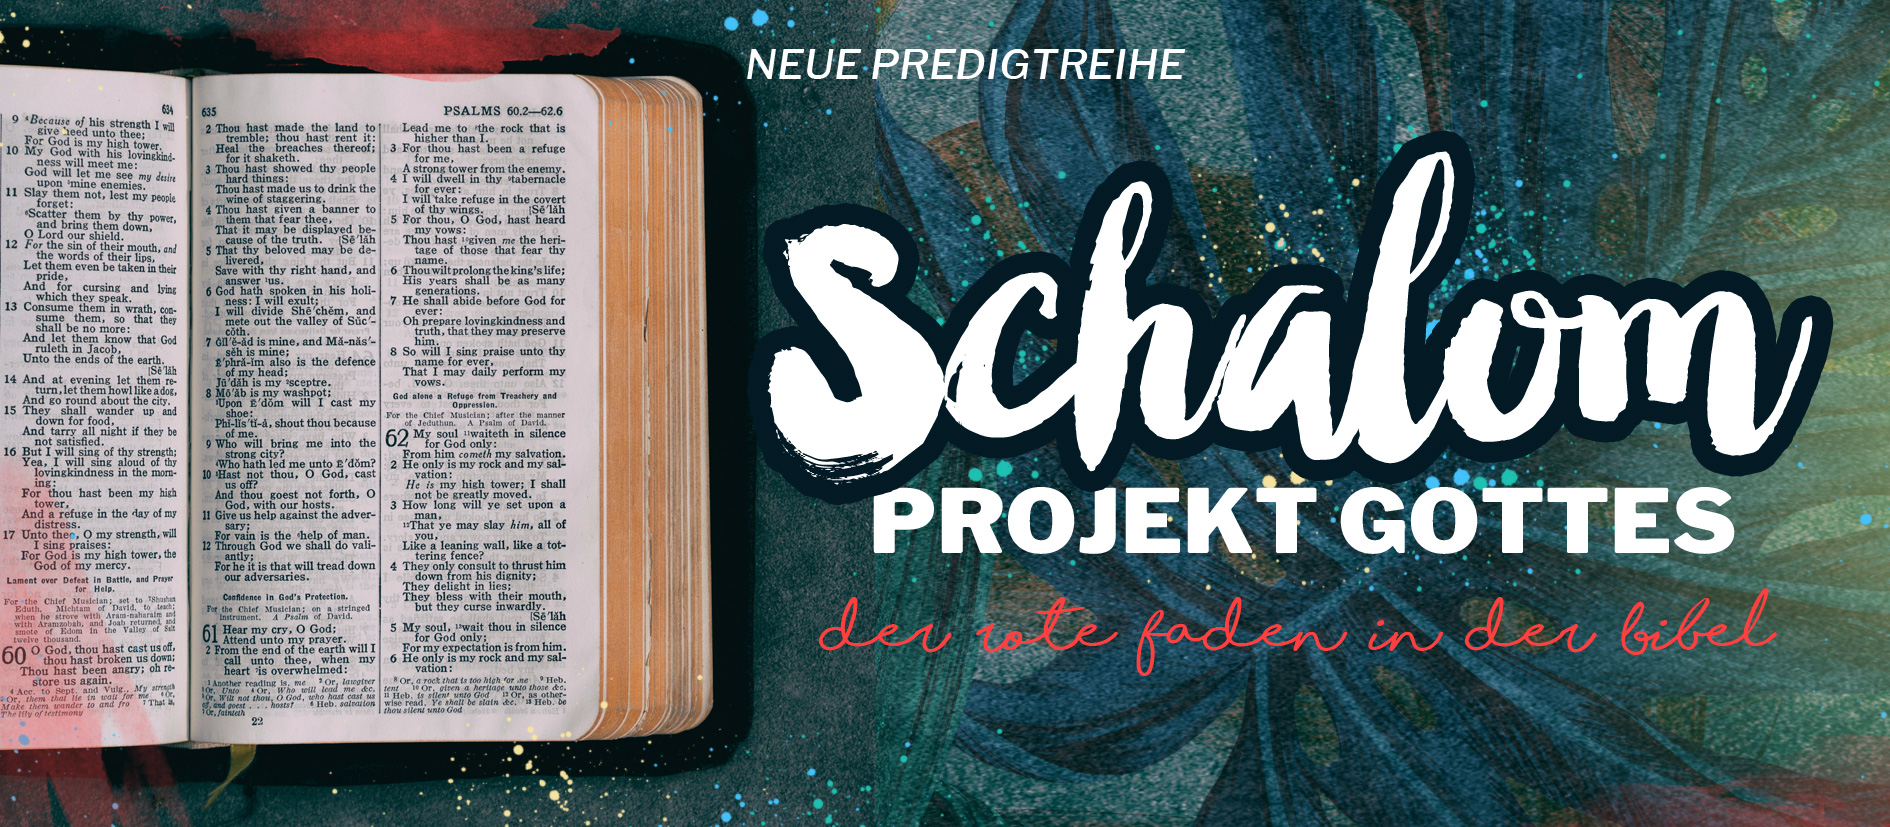 https://www.ev-freikirche-landau.de/wp-content/uploads/2019/10/SchalomProjekt.jpg